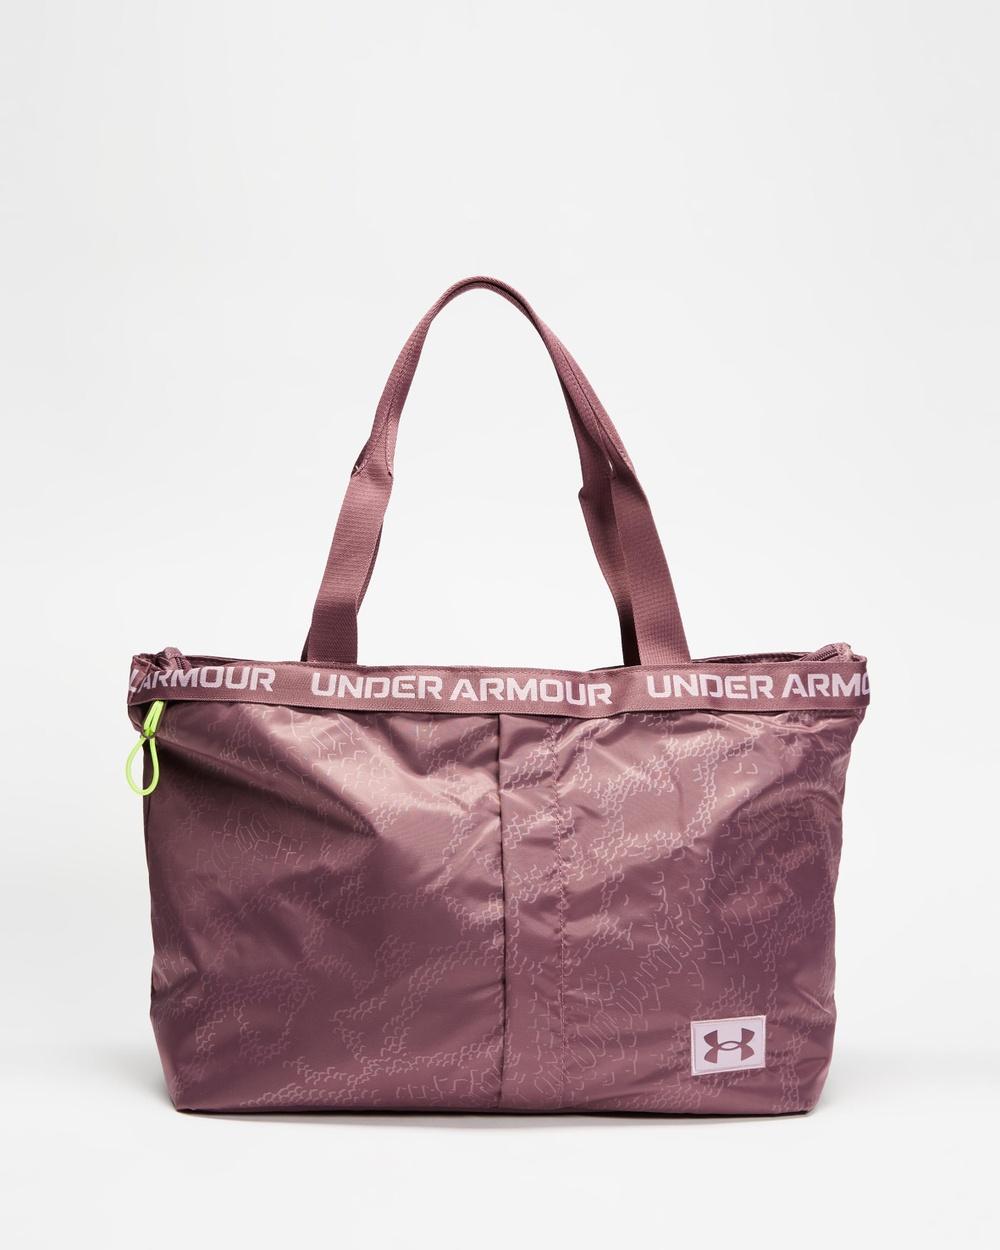 Under Armour Essentials Tote Bags Ash Plum & Mauve Pink